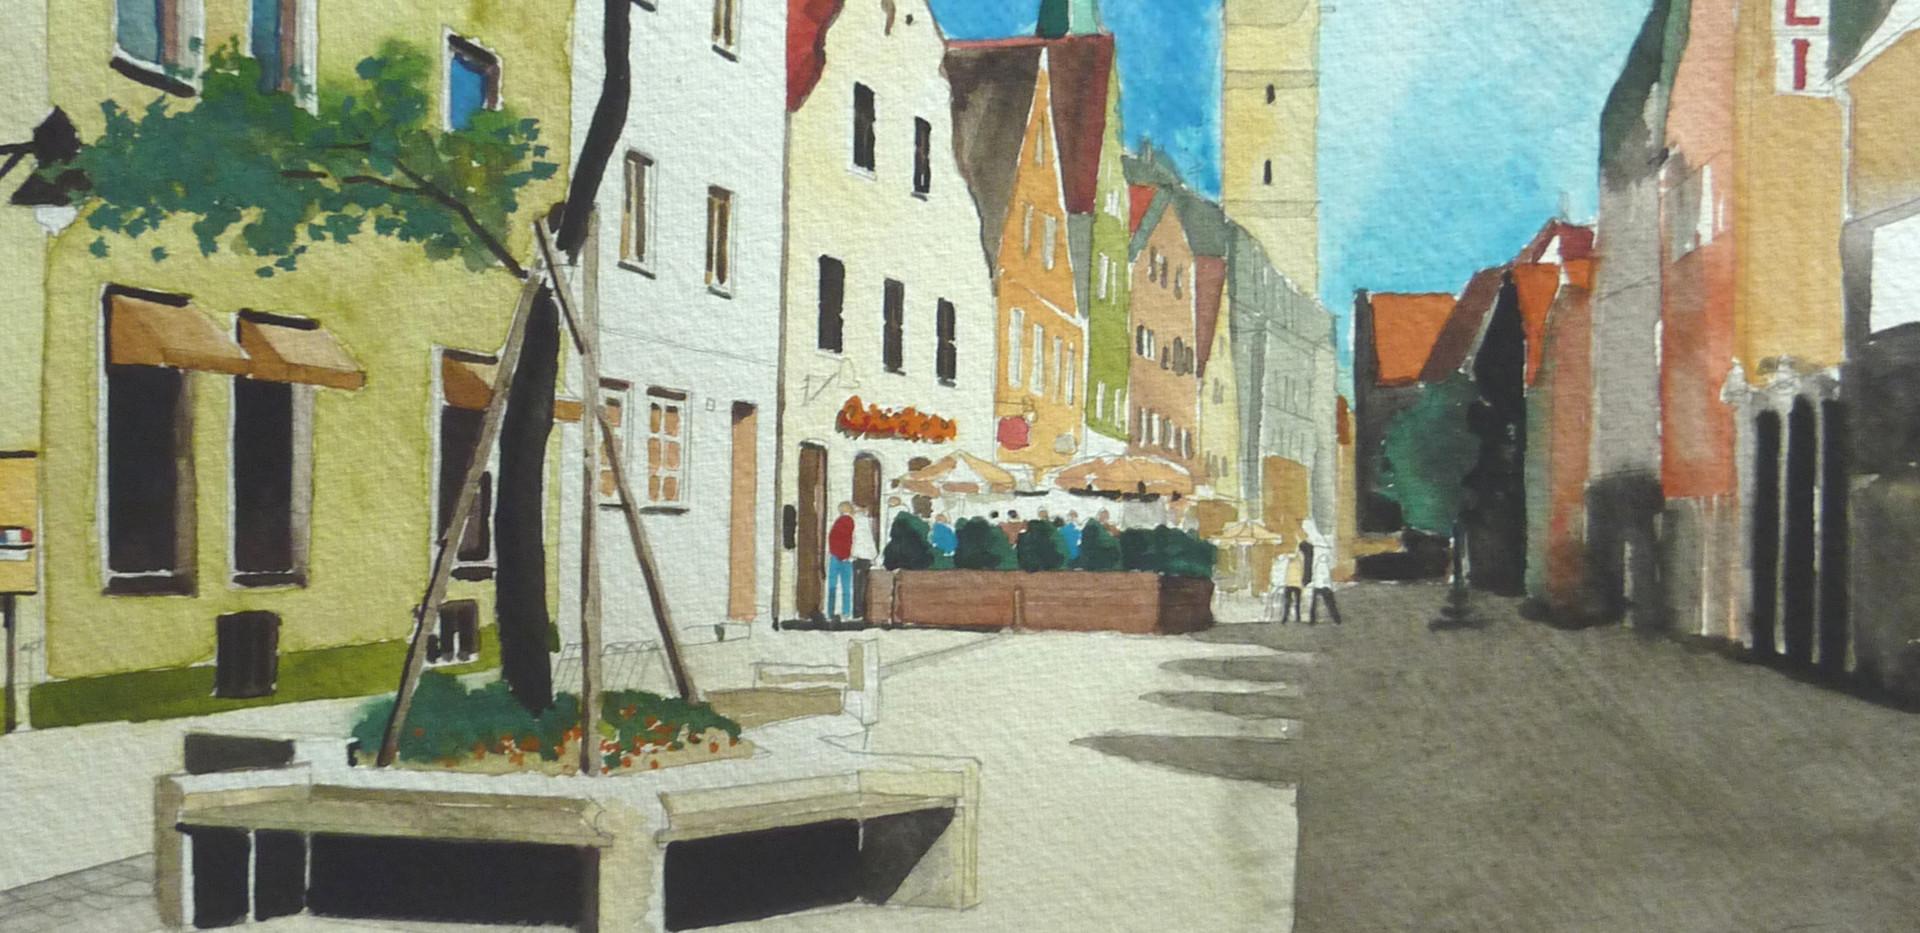 32 Dollstraße